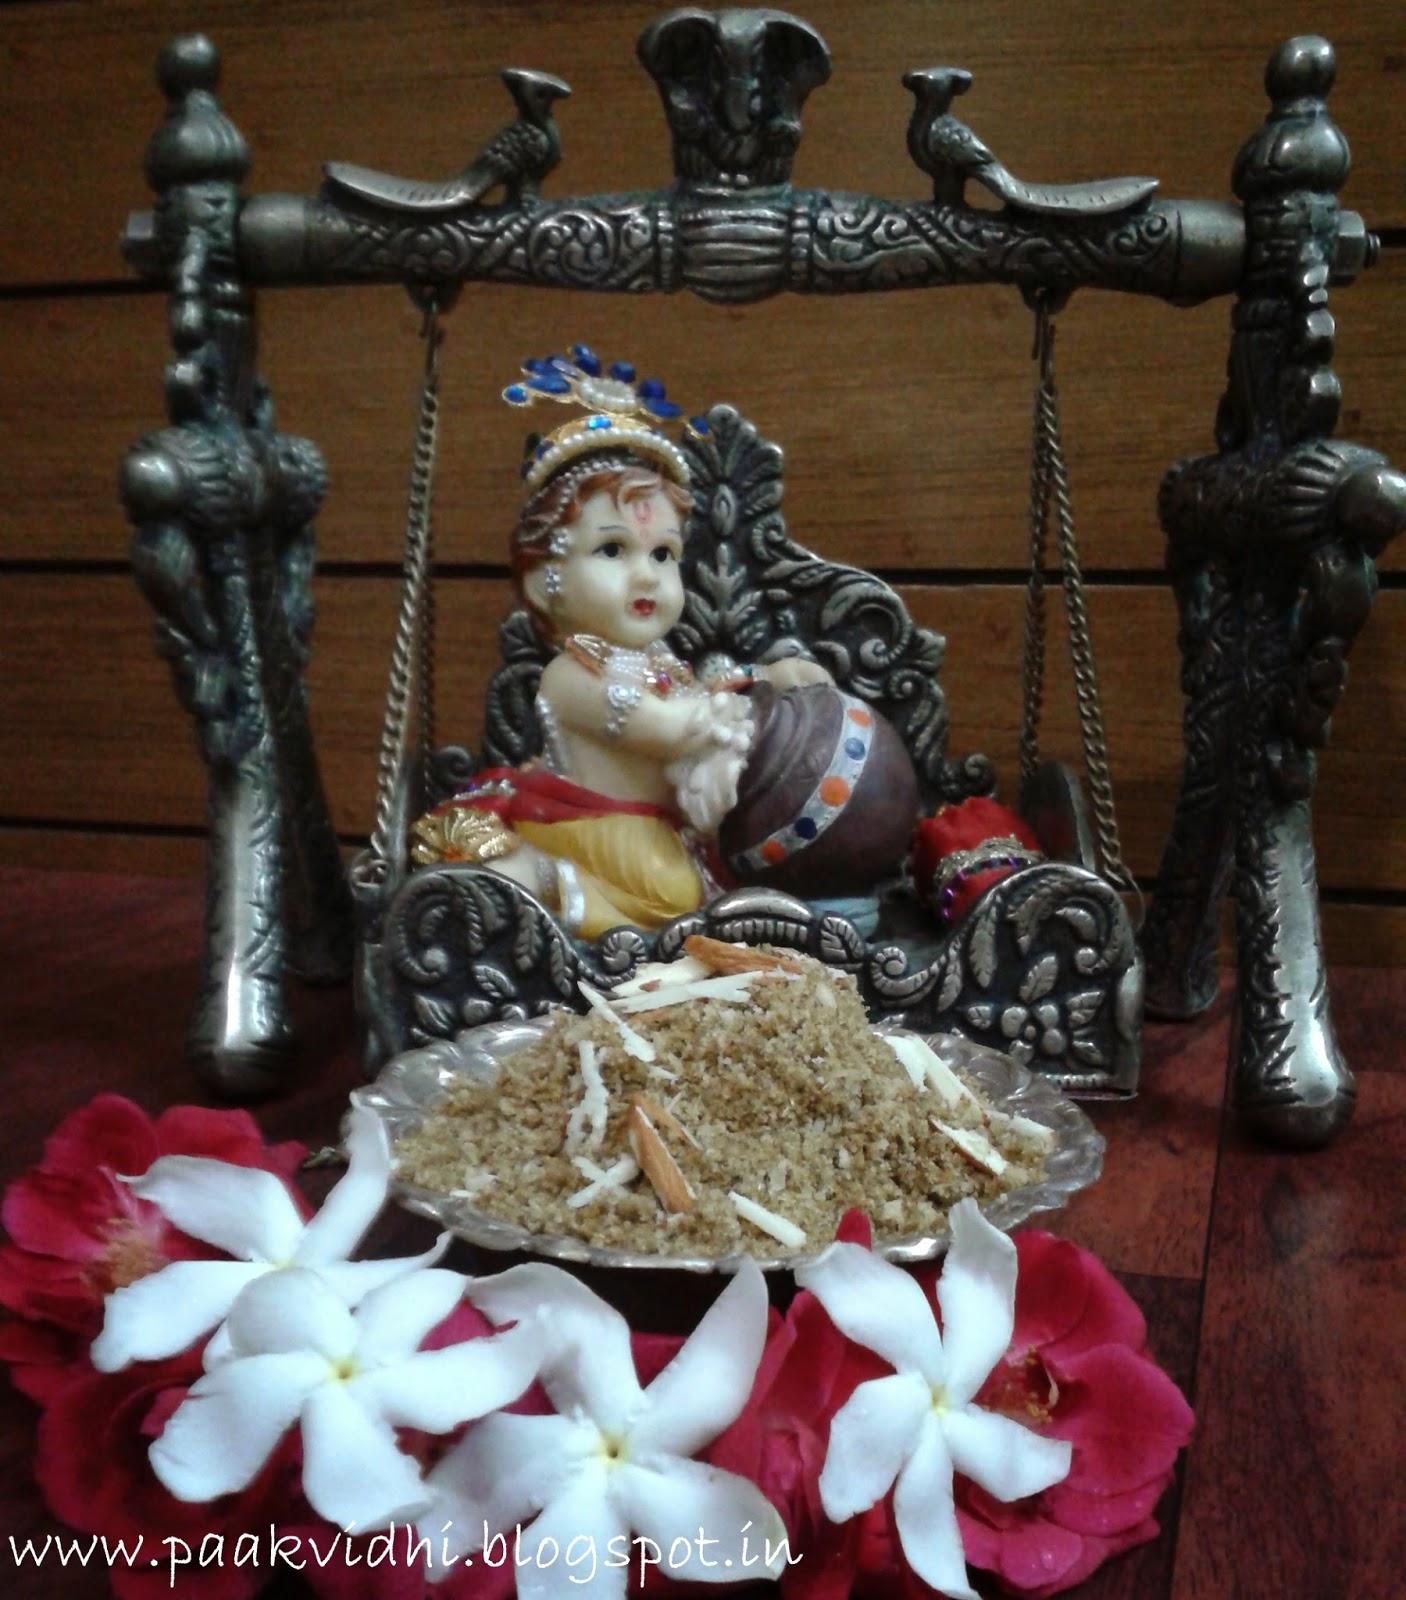 http://paakvidhi.blogspot.in/2014/08/dhania-prasad-for-krishna.html